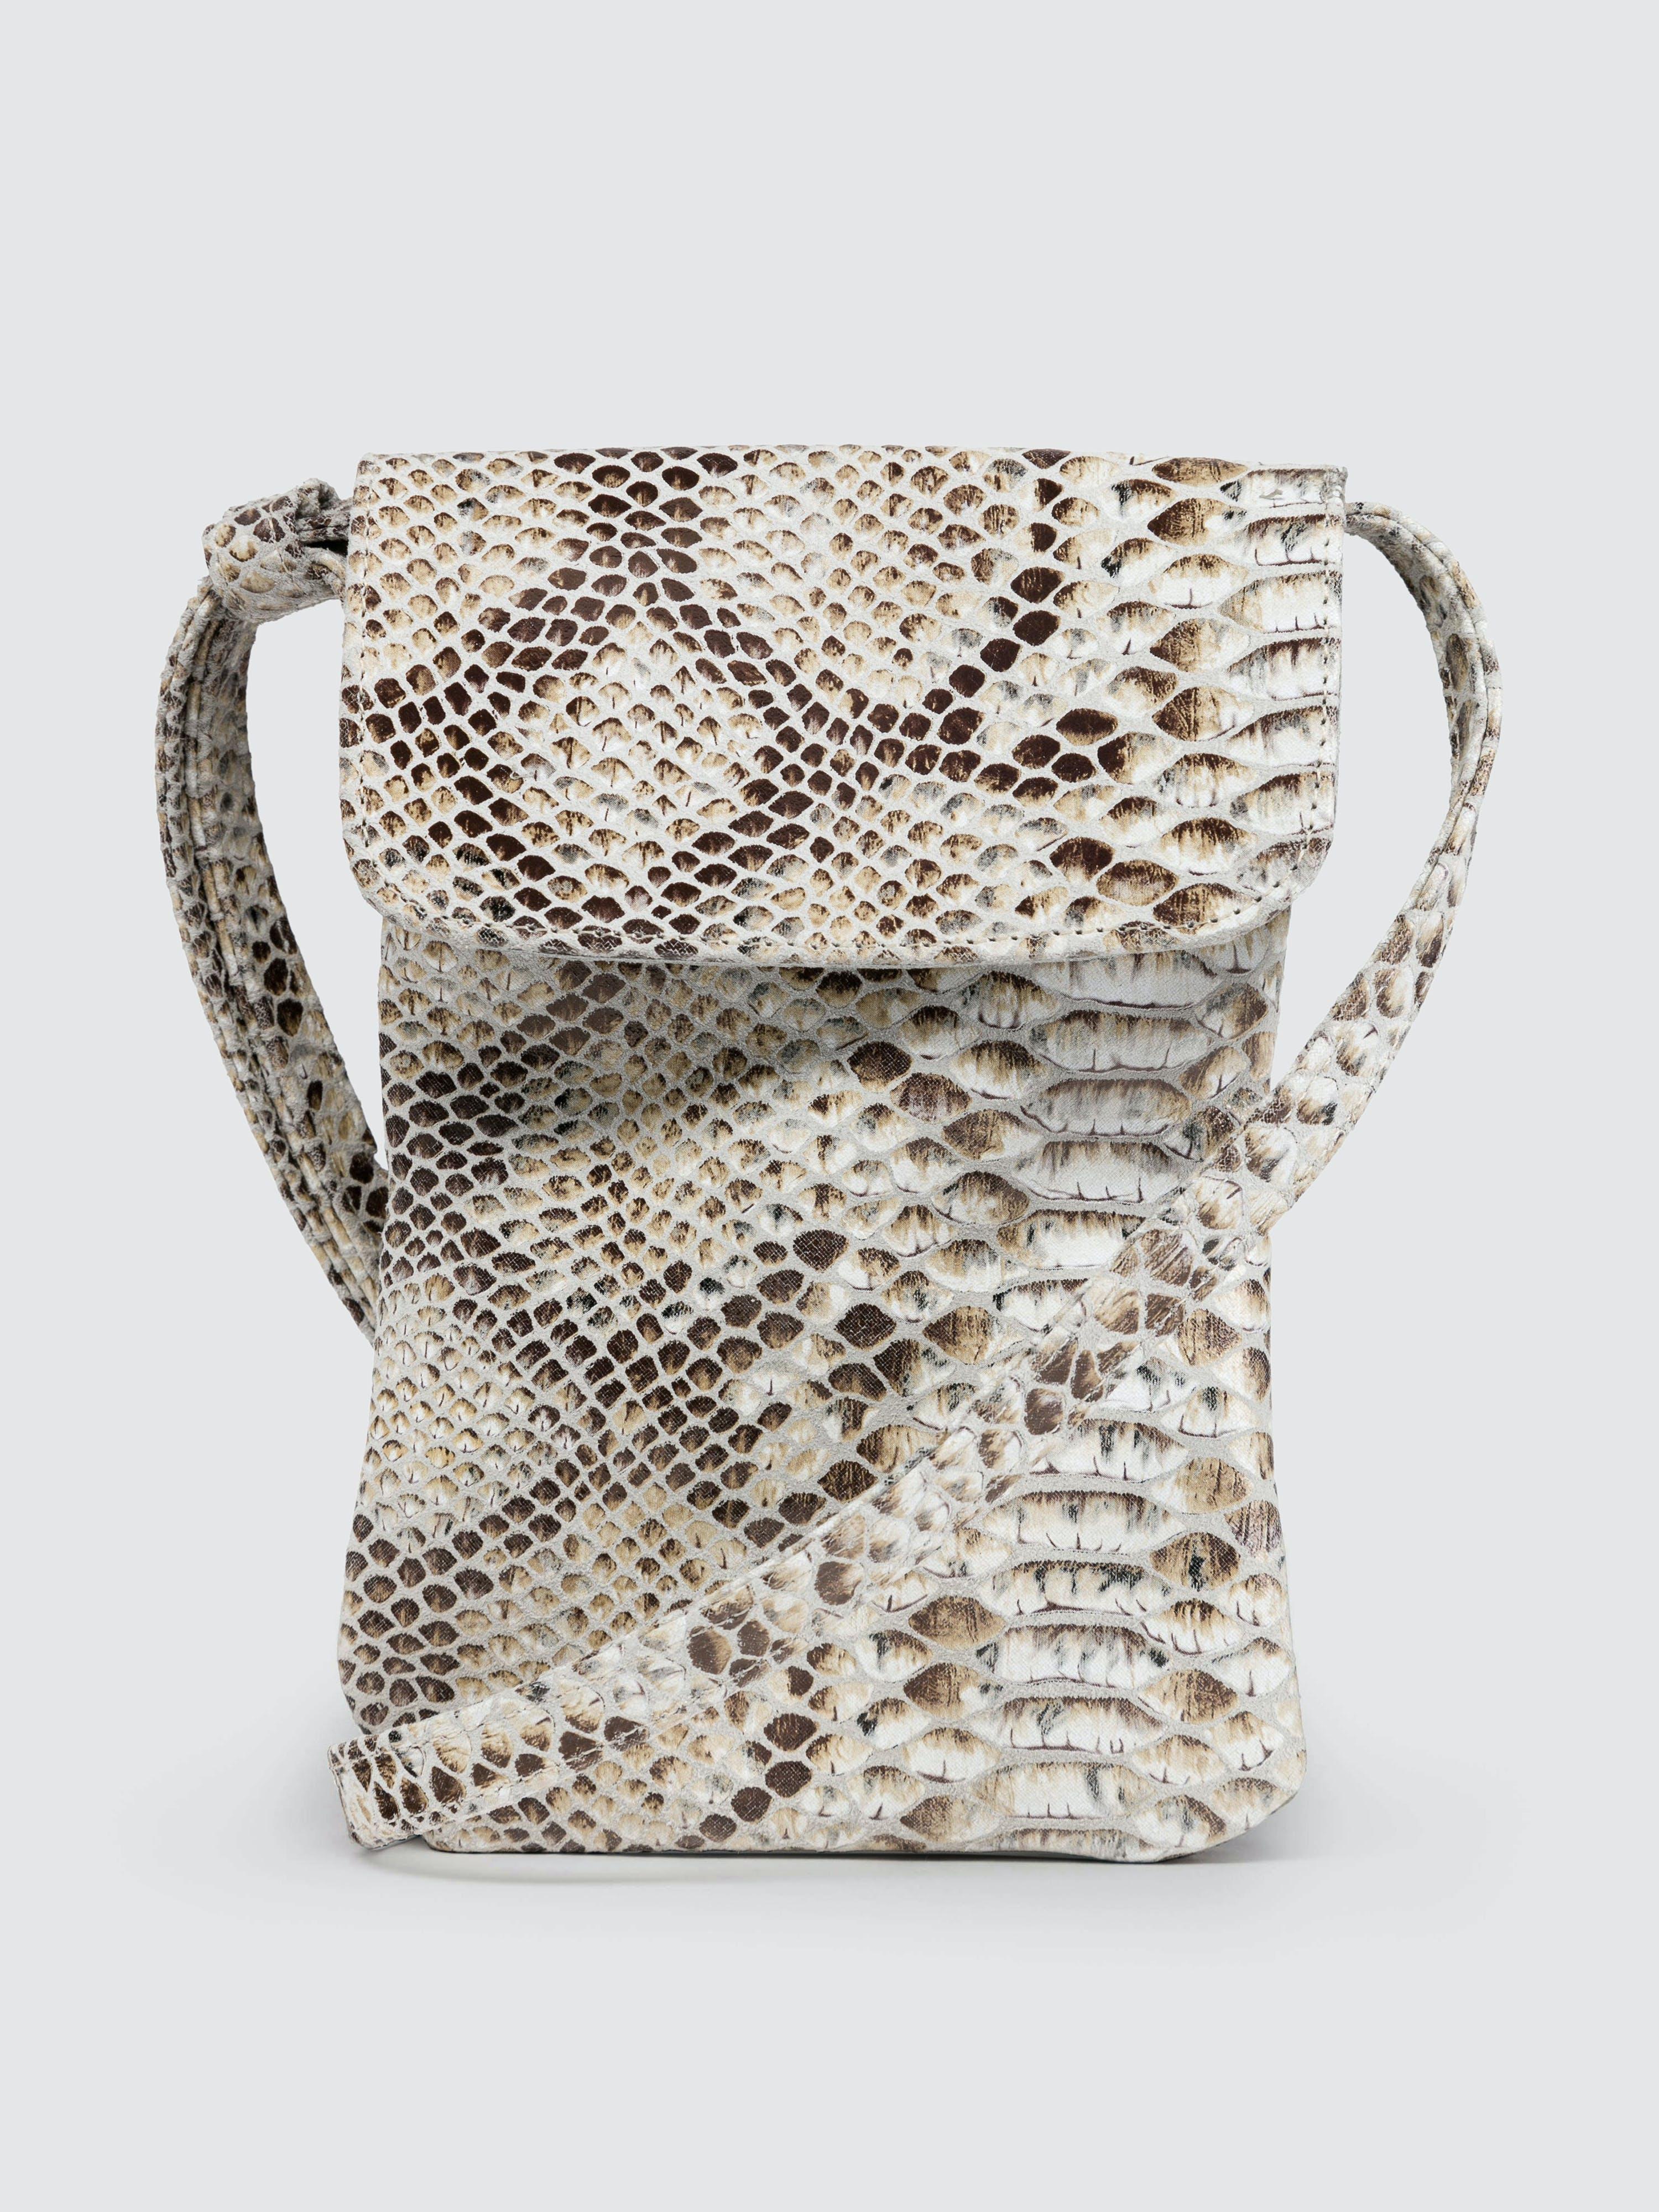 CoFi Leathers Penny Phone Bag: Camel Snake  - White